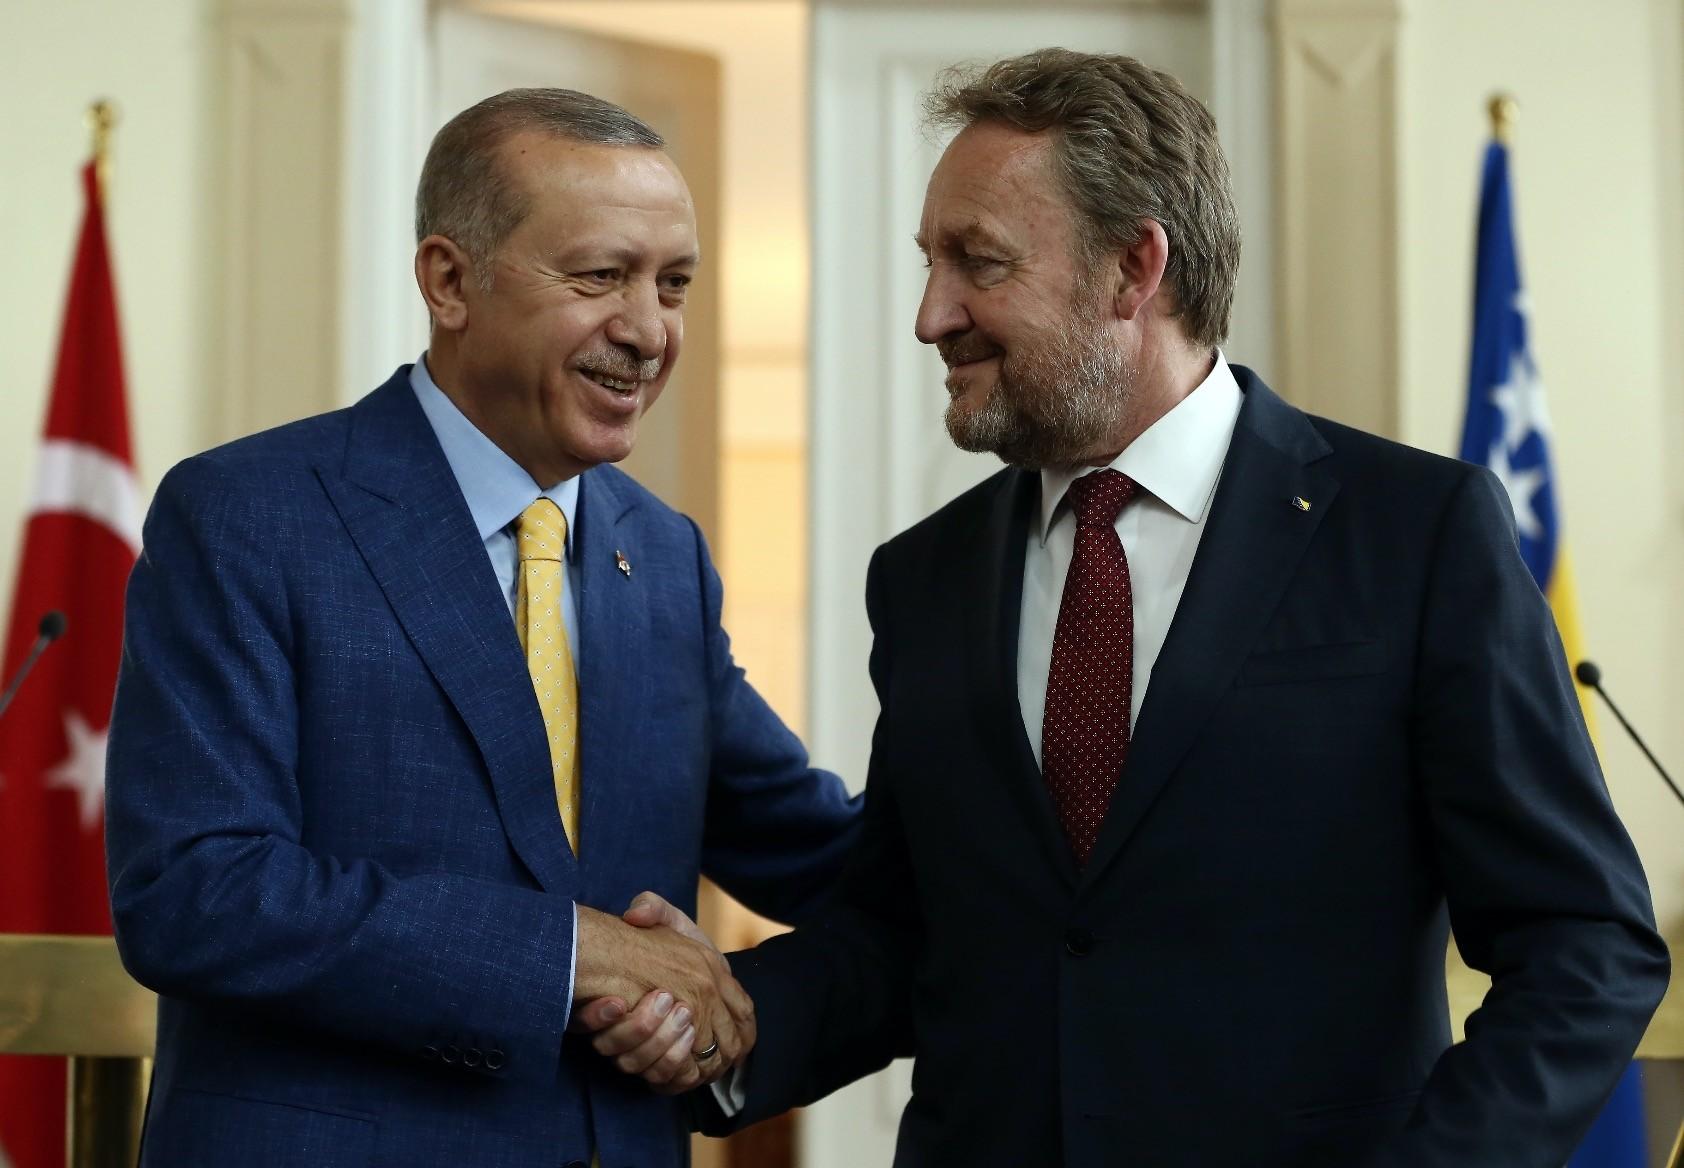 President Erdou011fan (L) shakes hands with Bakir Izetbegovic, the Bosniak member of the tripartite Presidency of Bosnia and Herzegovina, in Sarajevo yesterday.